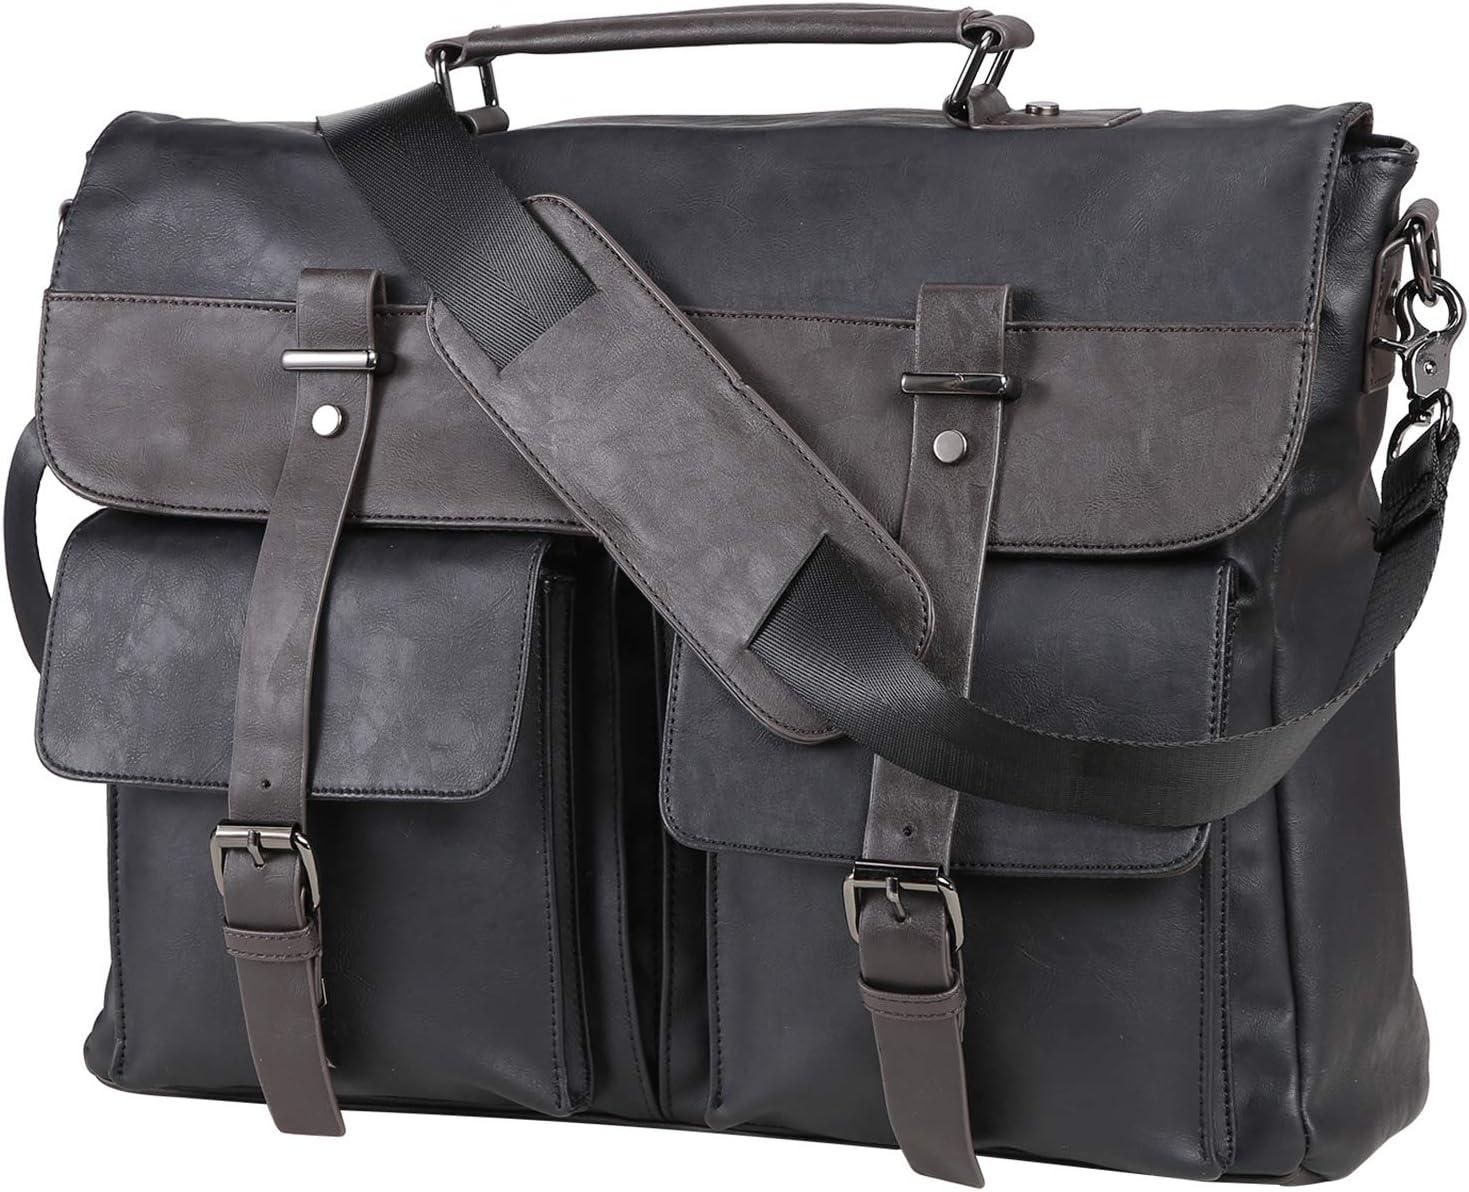 Unisex Leather Bag Man Leather Bag FREE SHIPPING Brushed Leather Messenger Bag Zippered Leather Bag Leather Vertical Laptop Bag